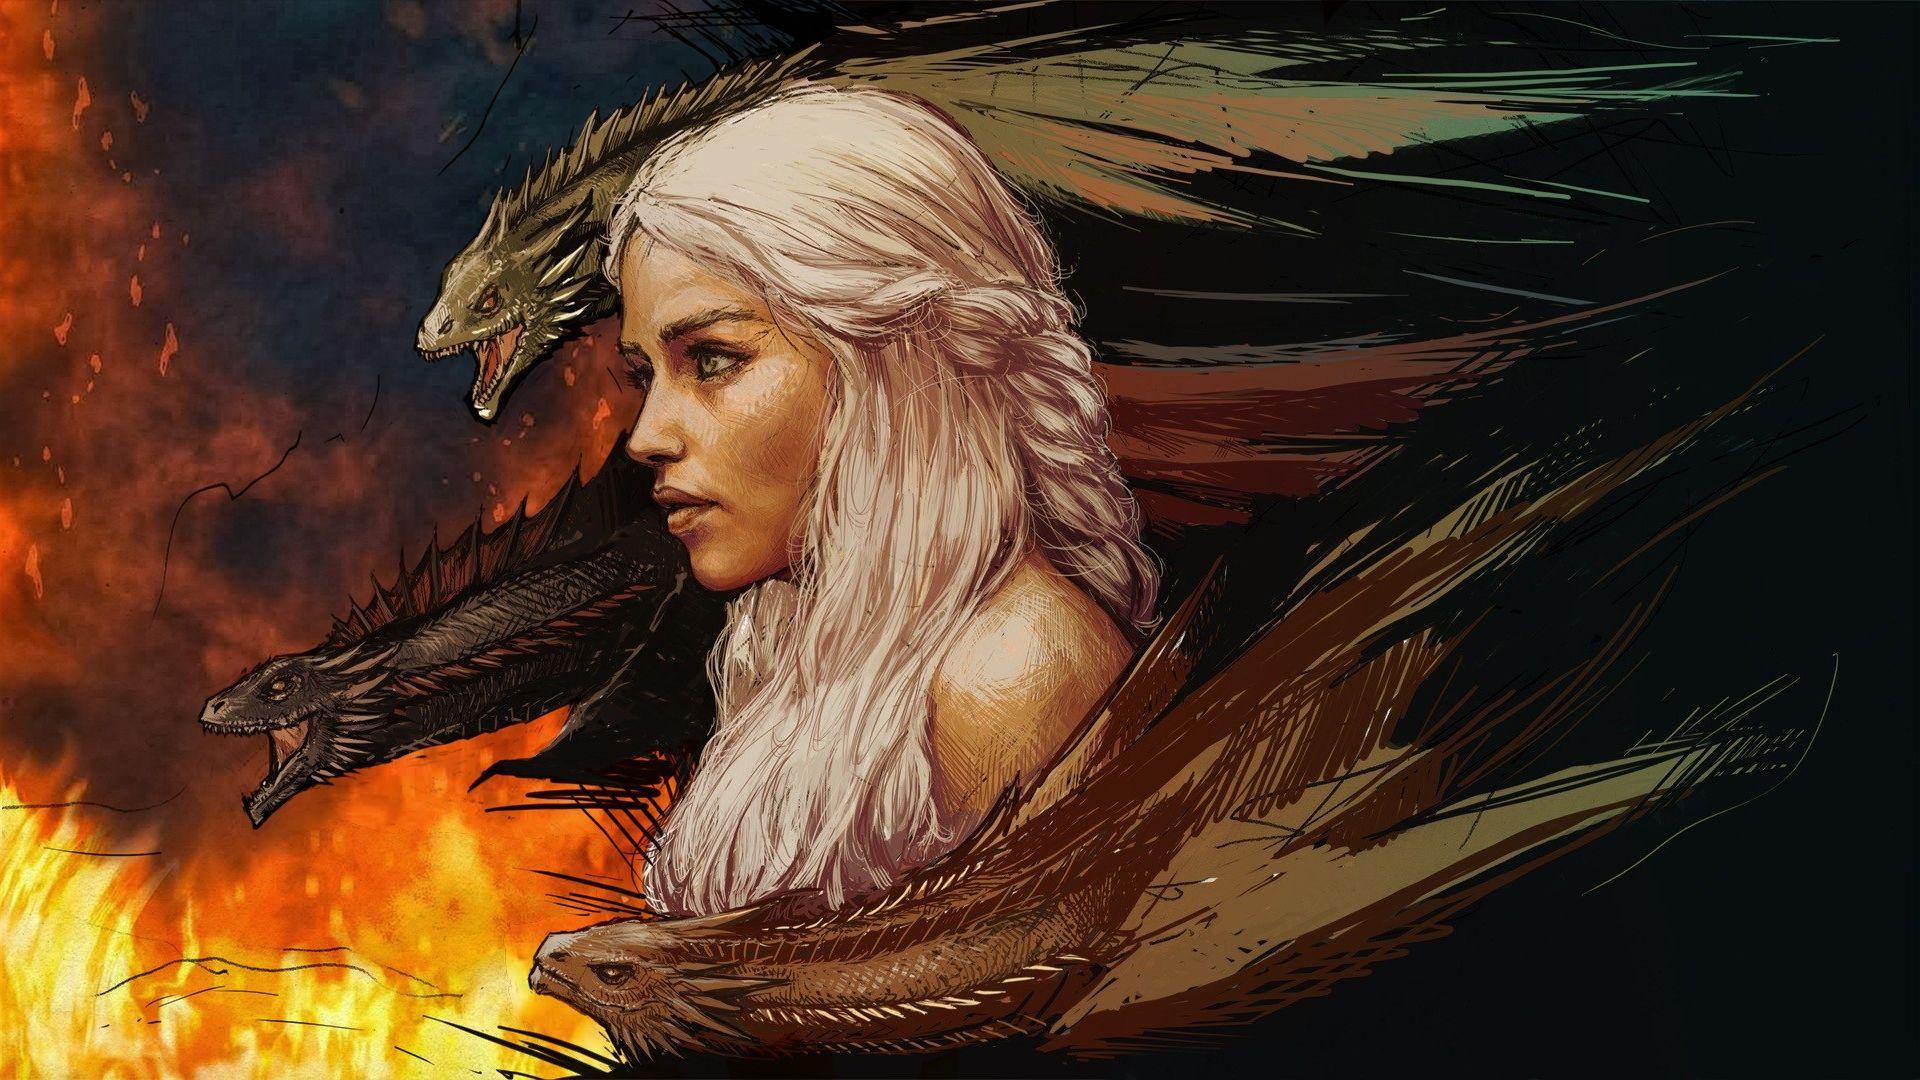 Game of Thrones Daenerys Dragon art